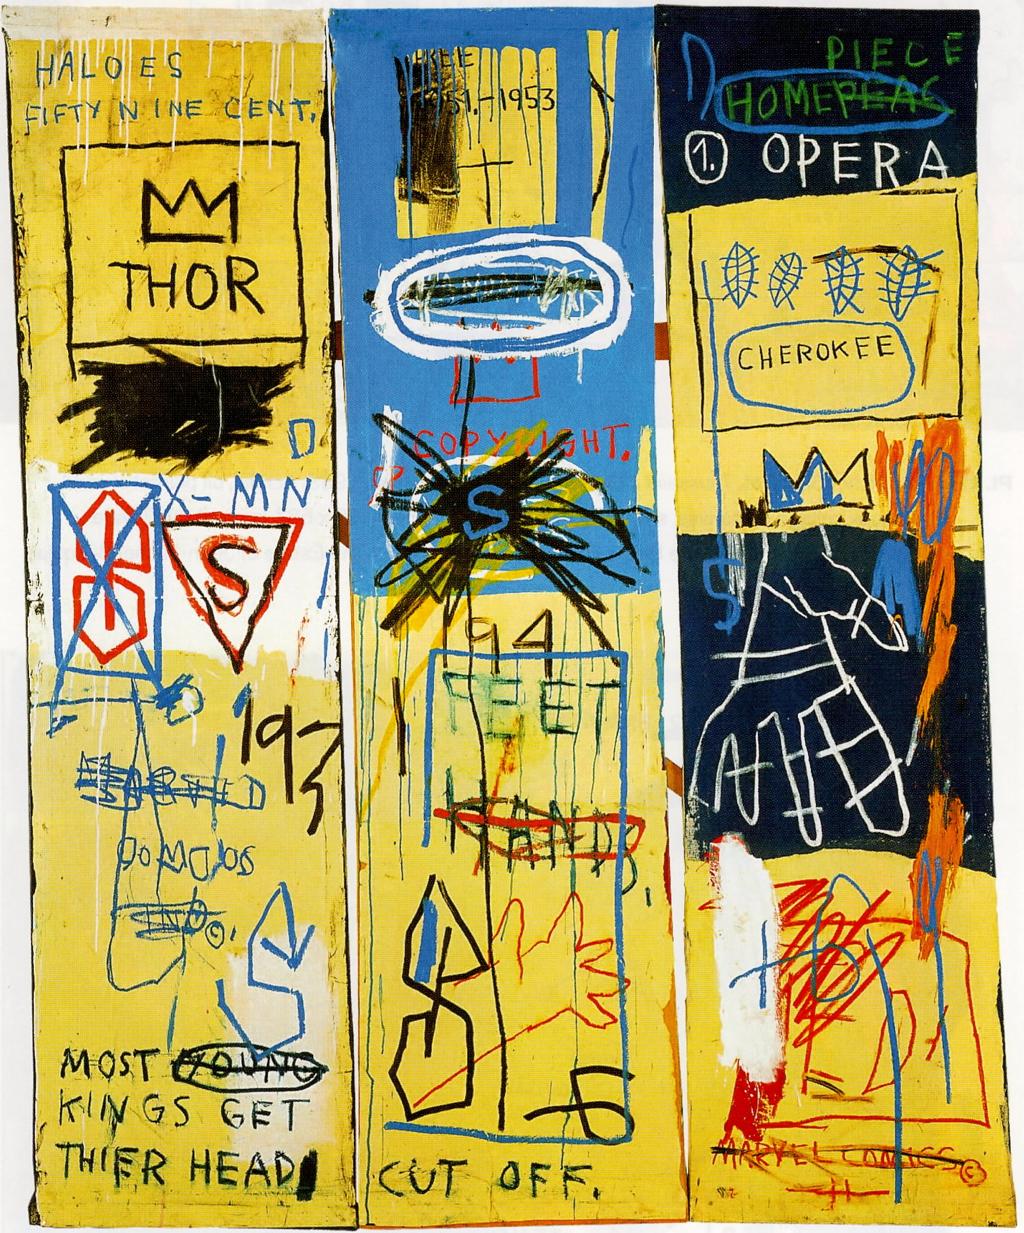 PrintedMatter_Stuebner_Basquiat_02.jpg